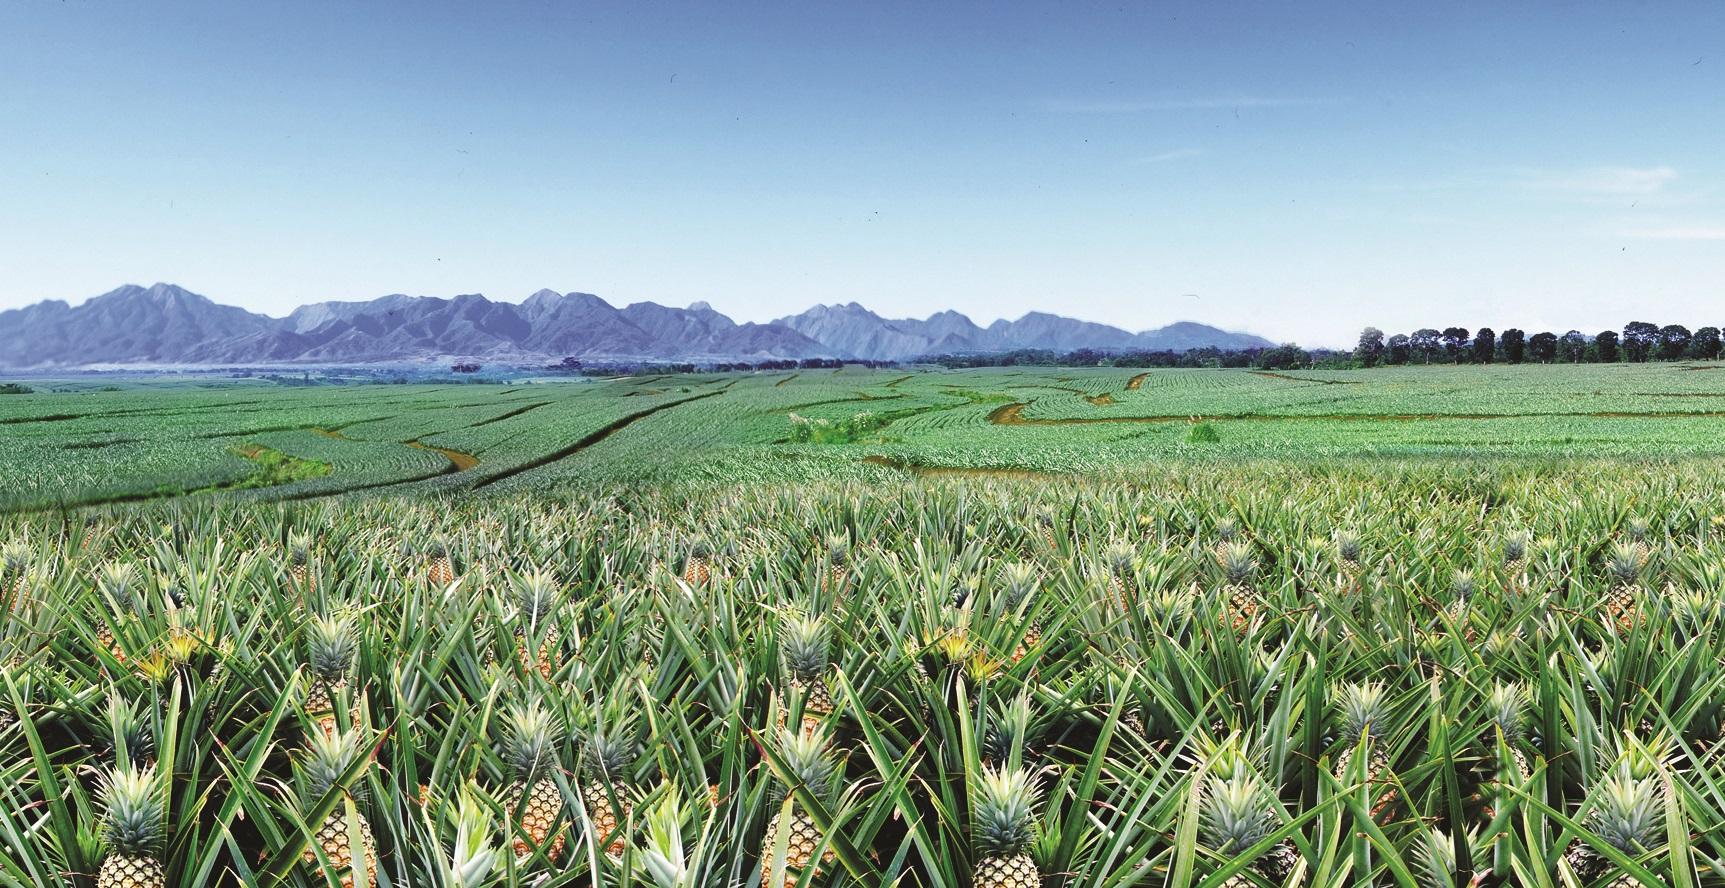 Trang trại dứa rộng 26.000 ha ở Bukidnon của Del Monte Philippines